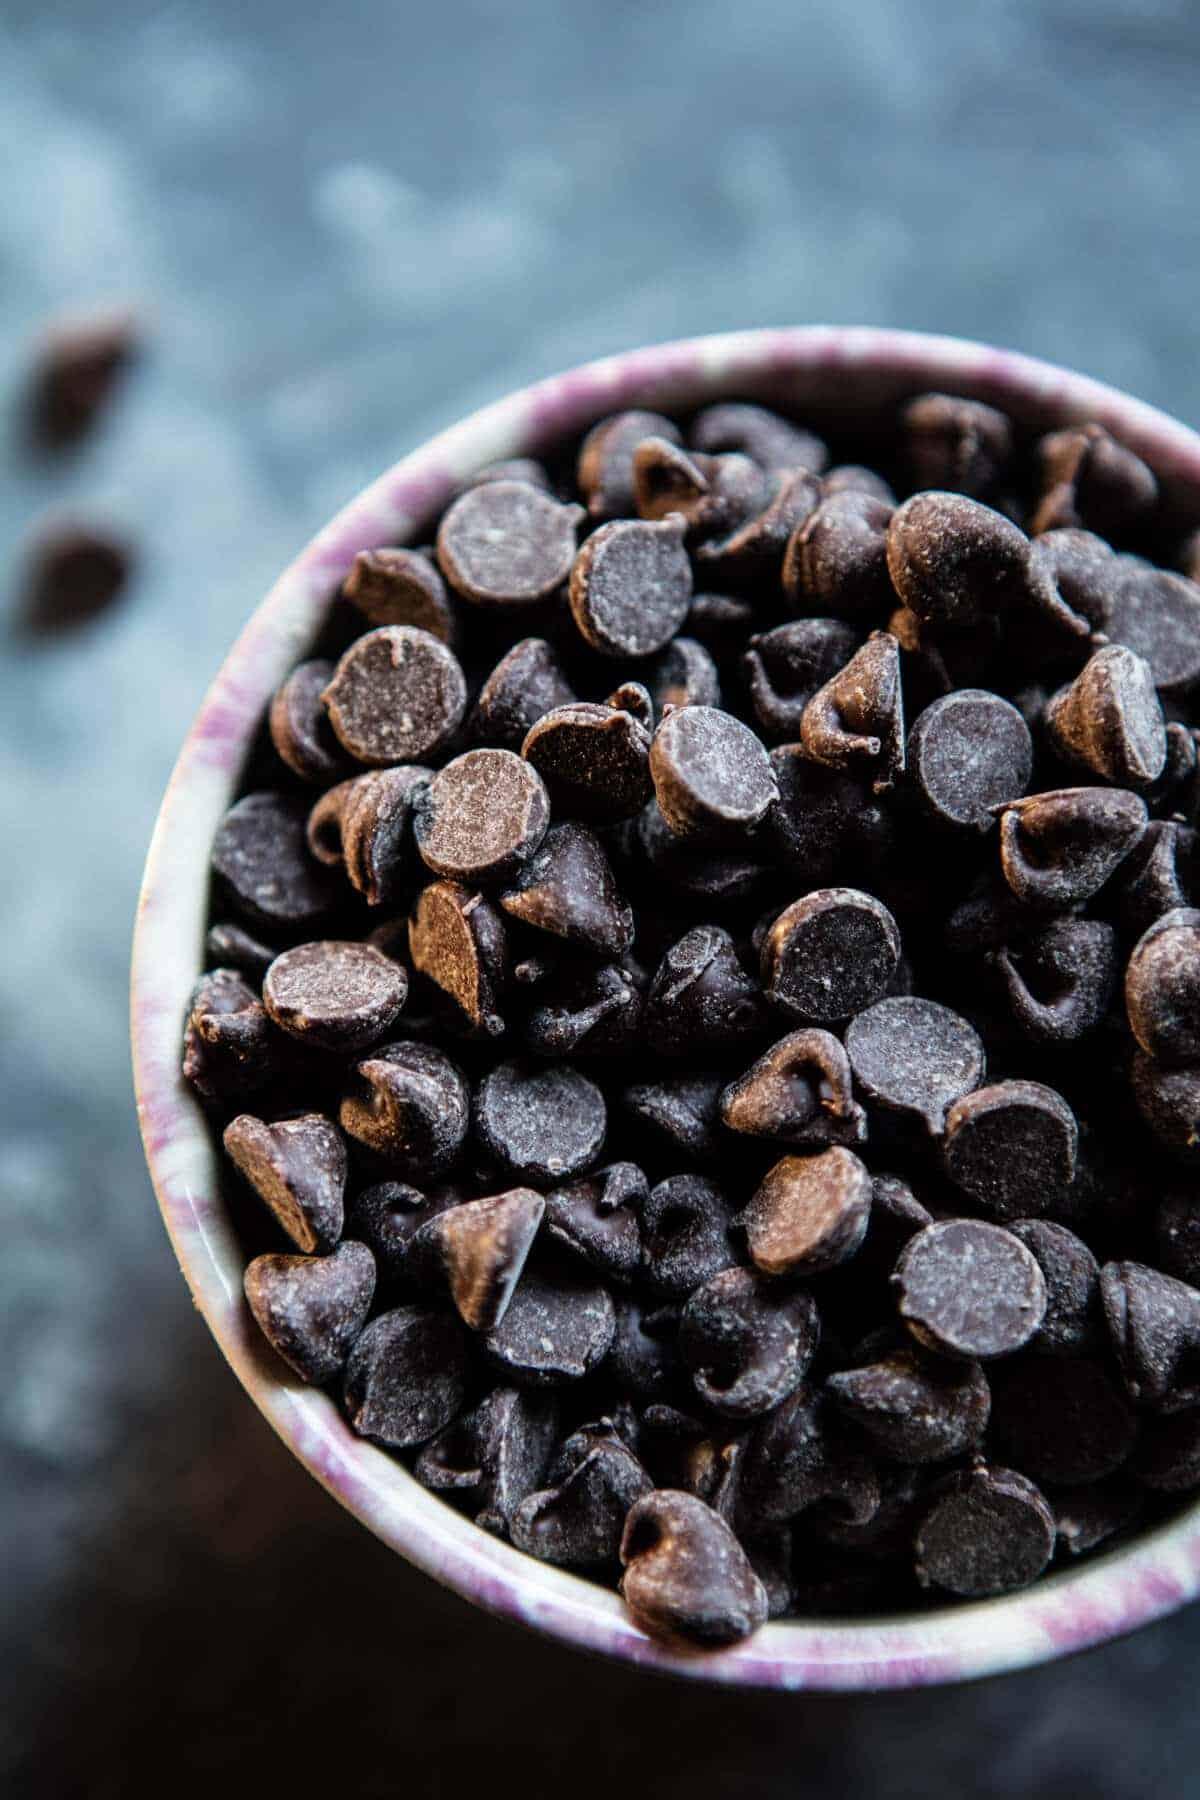 Nourishing 7 Ingredient Chocolate Chip Ricotta Banana Bread | halfbakedharvest.com @hbharvest